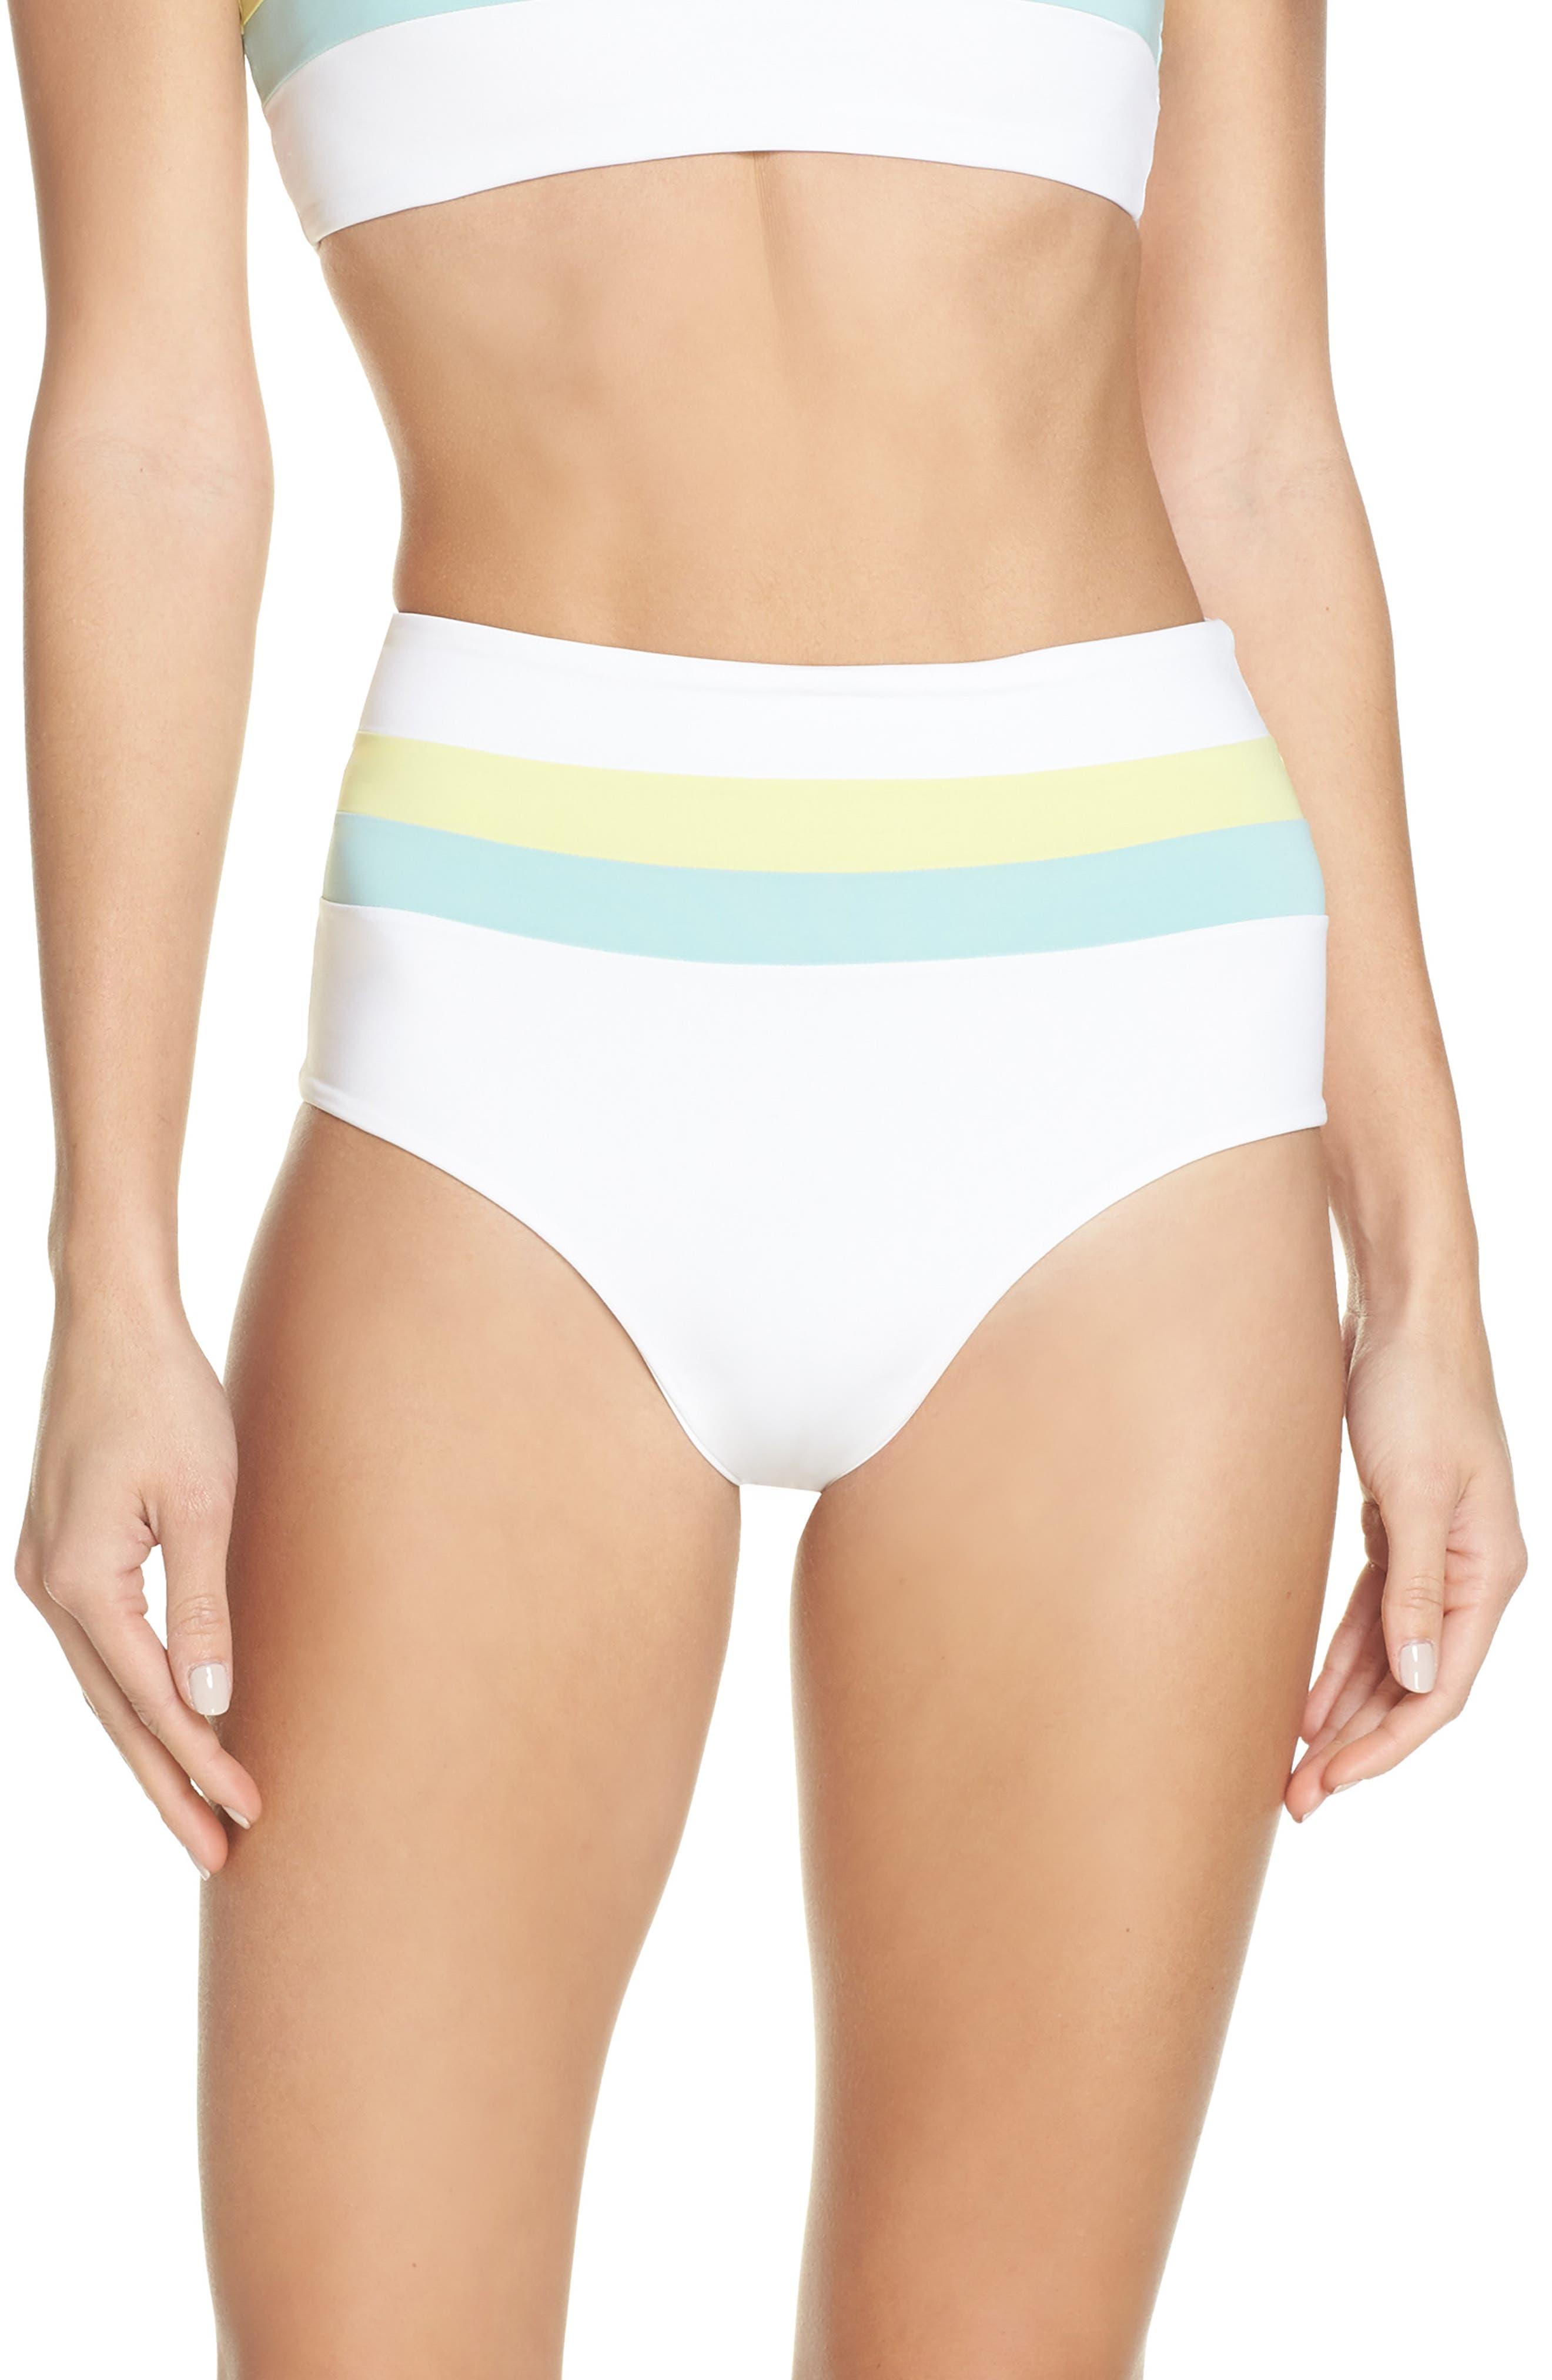 L SPACE Portia Reversible High Waist Bikini Bottoms, Main, color, WHITE/ LIGHT TURQ/ LEMONADE